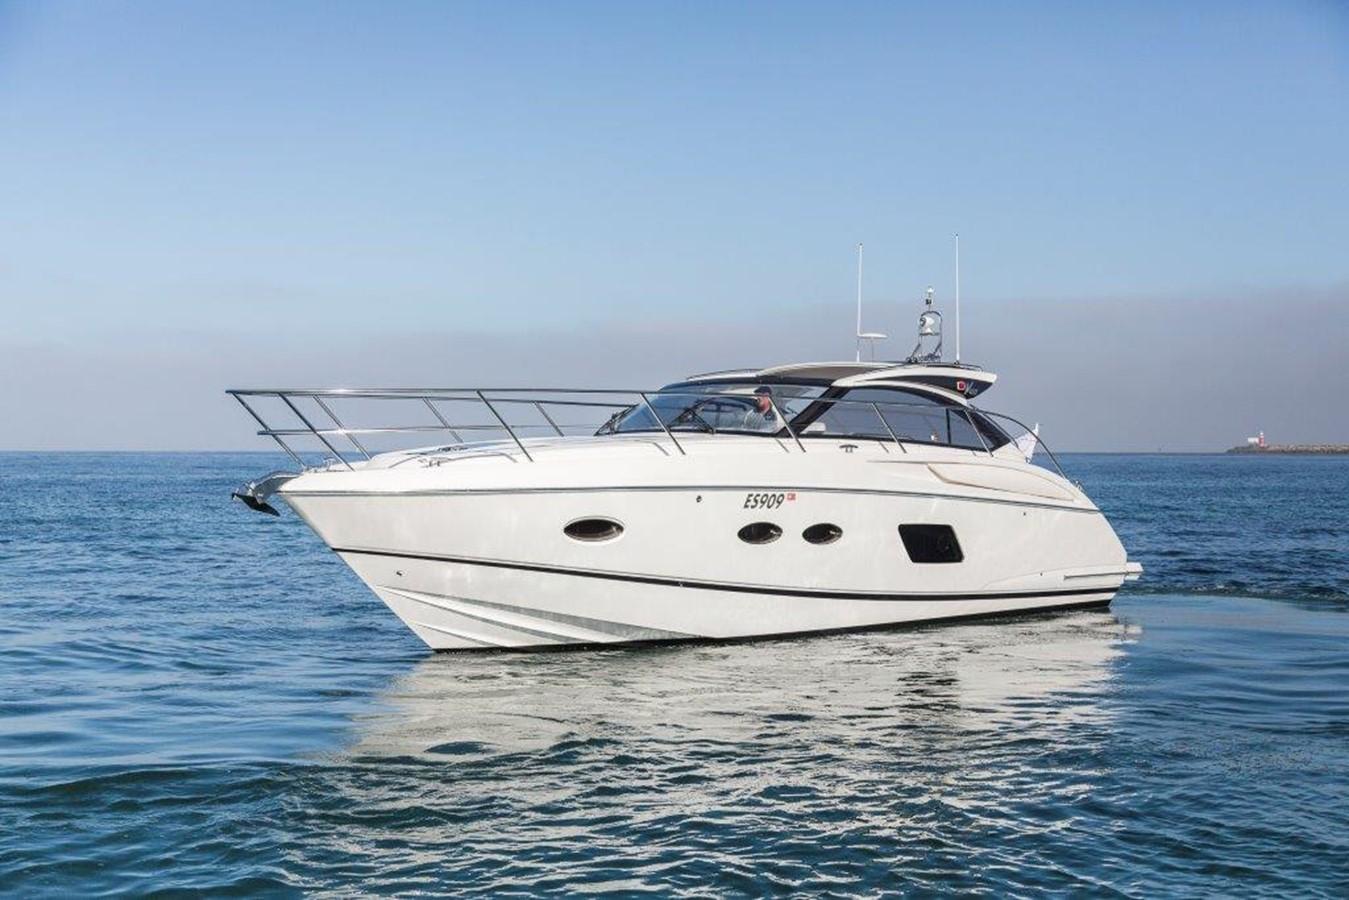 V39 yacht for sale